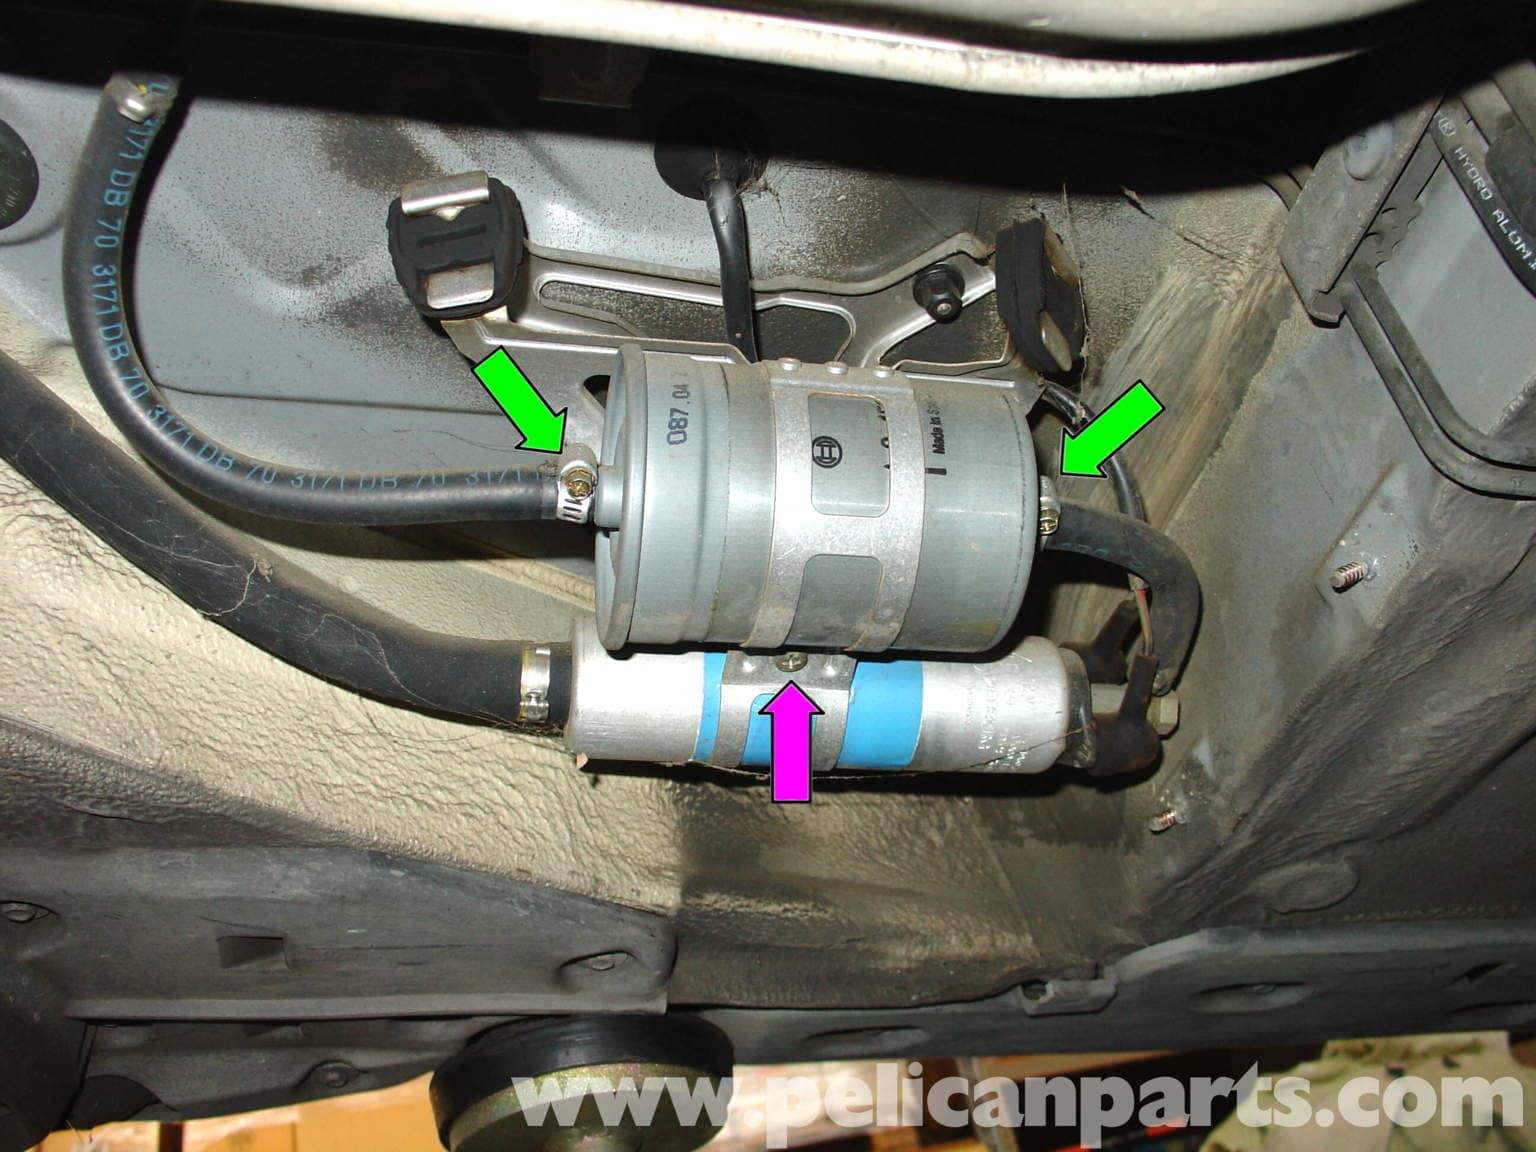 volvo 940 wiring diagram 1995 mercedes benz w210 fuel filter replacement  1996 03  e320  mercedes benz w210 fuel filter replacement  1996 03  e320